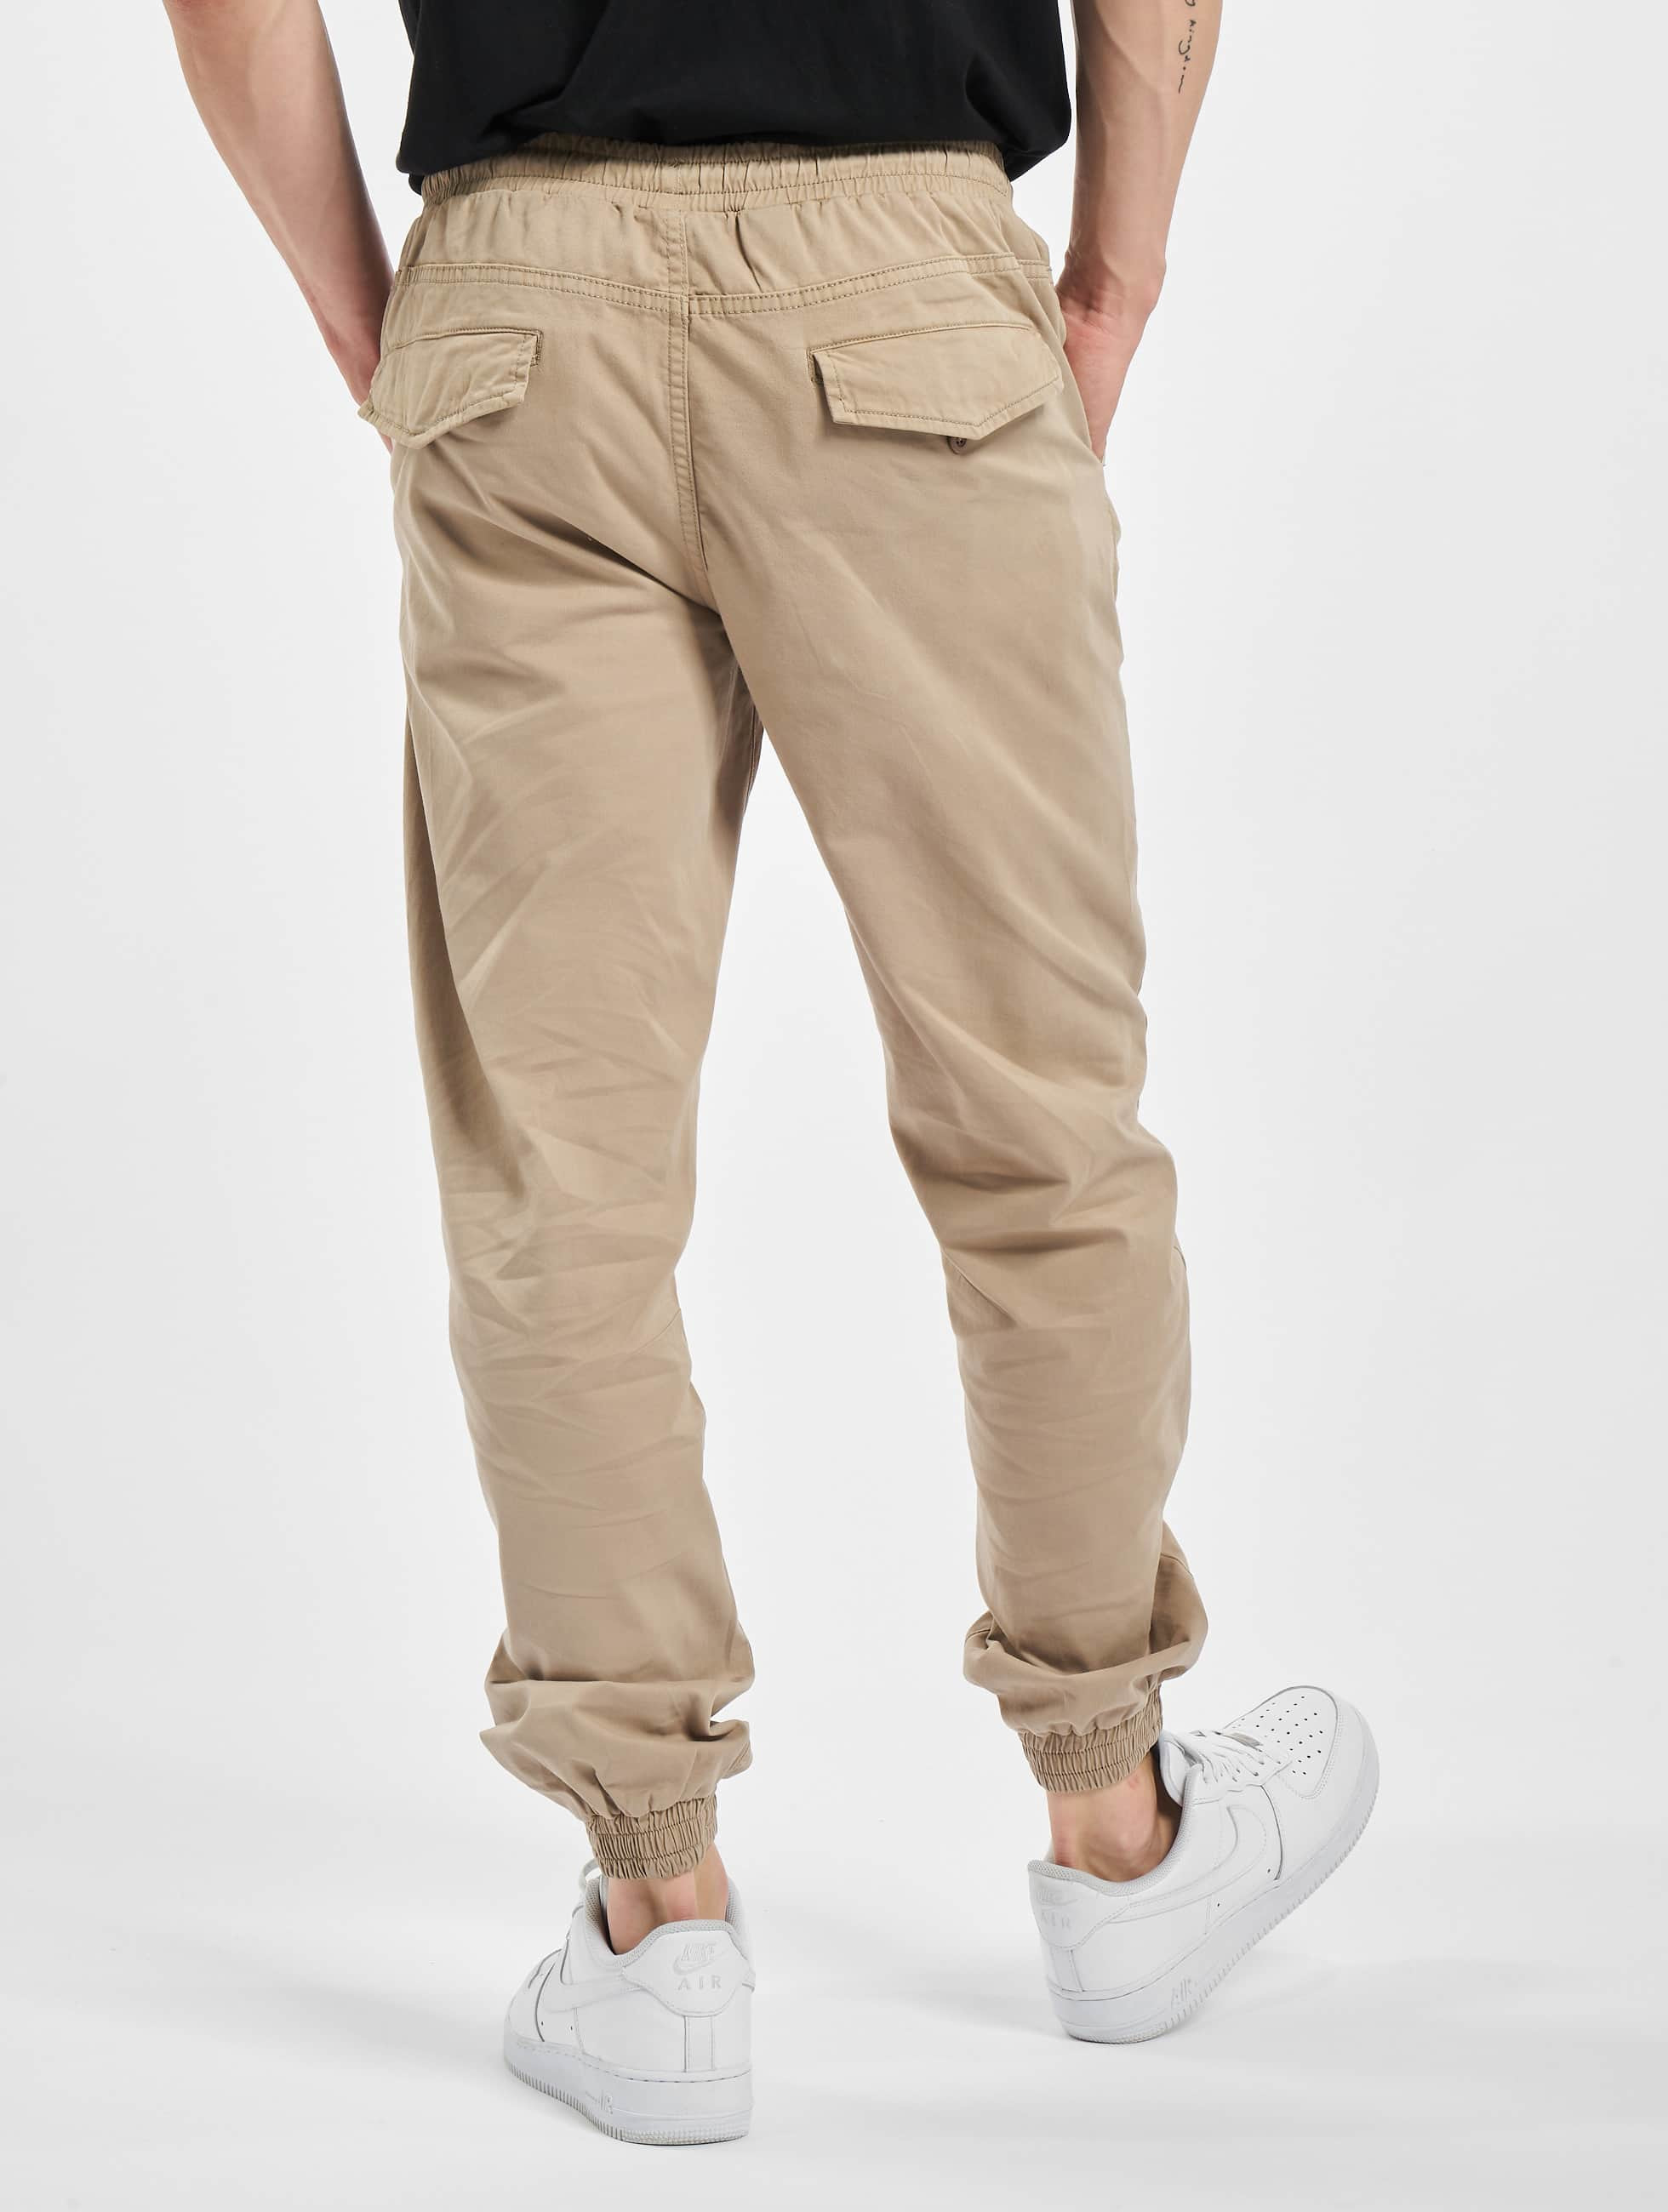 Urban Classics Pantalone ginnico Stretch Twill beige